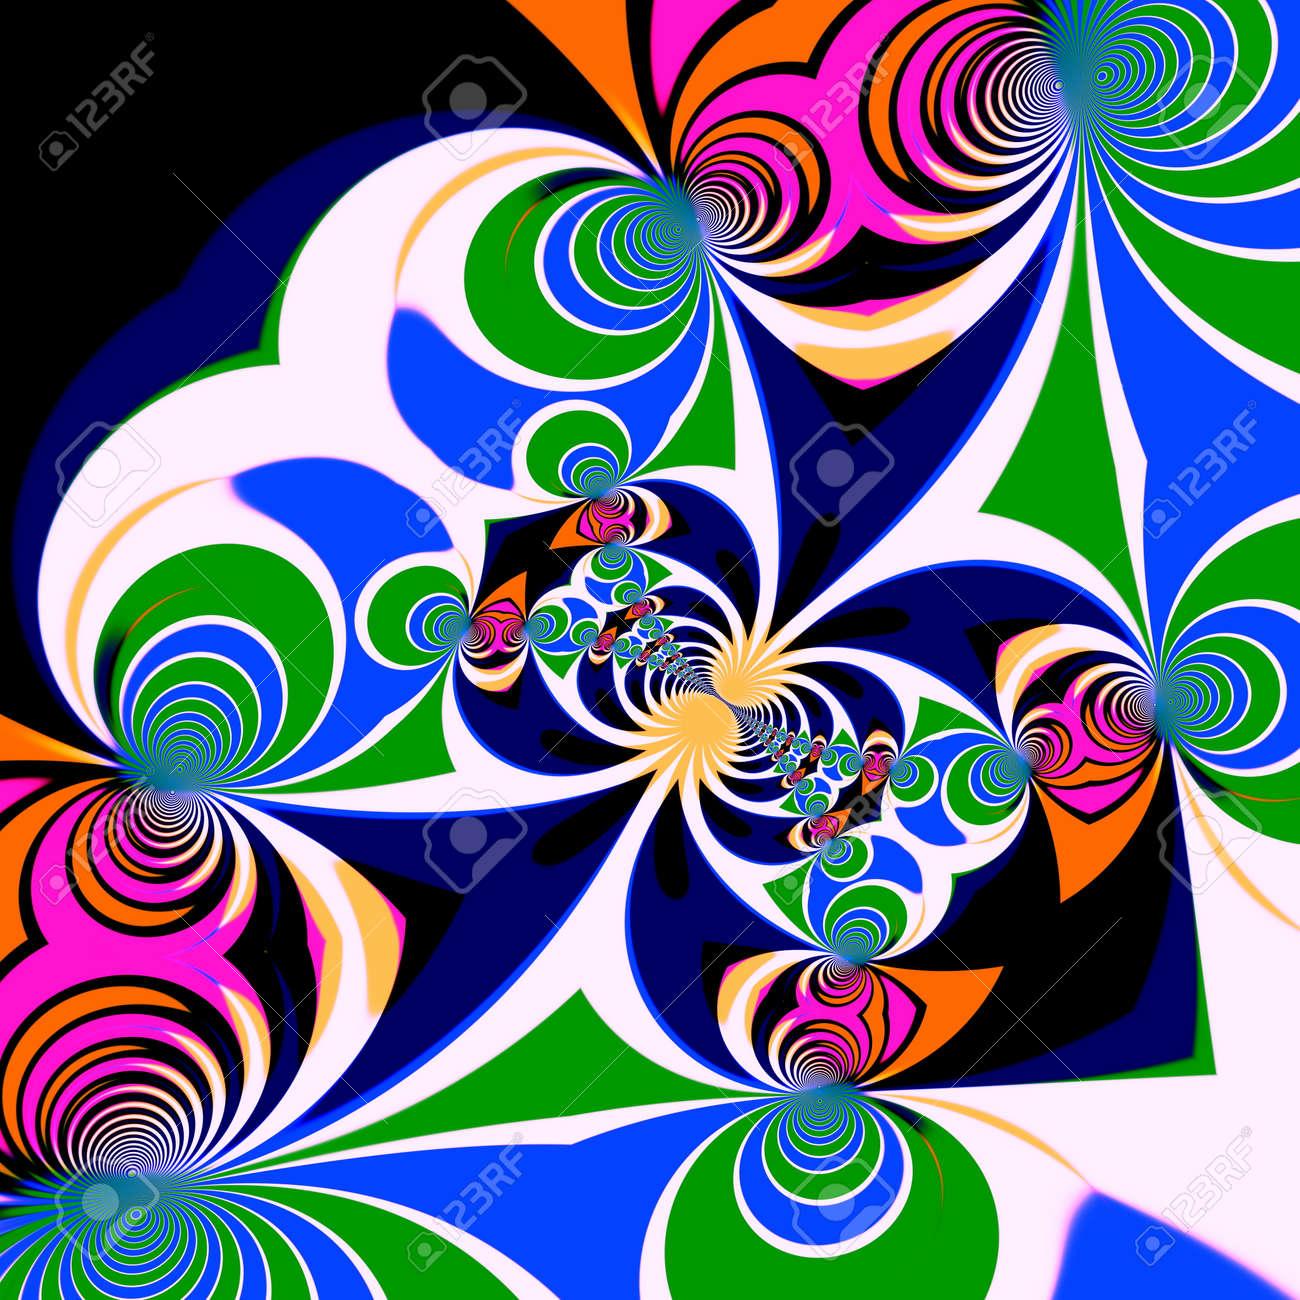 Psychedelic Style Background. Illustration Design. Symmetrical ...